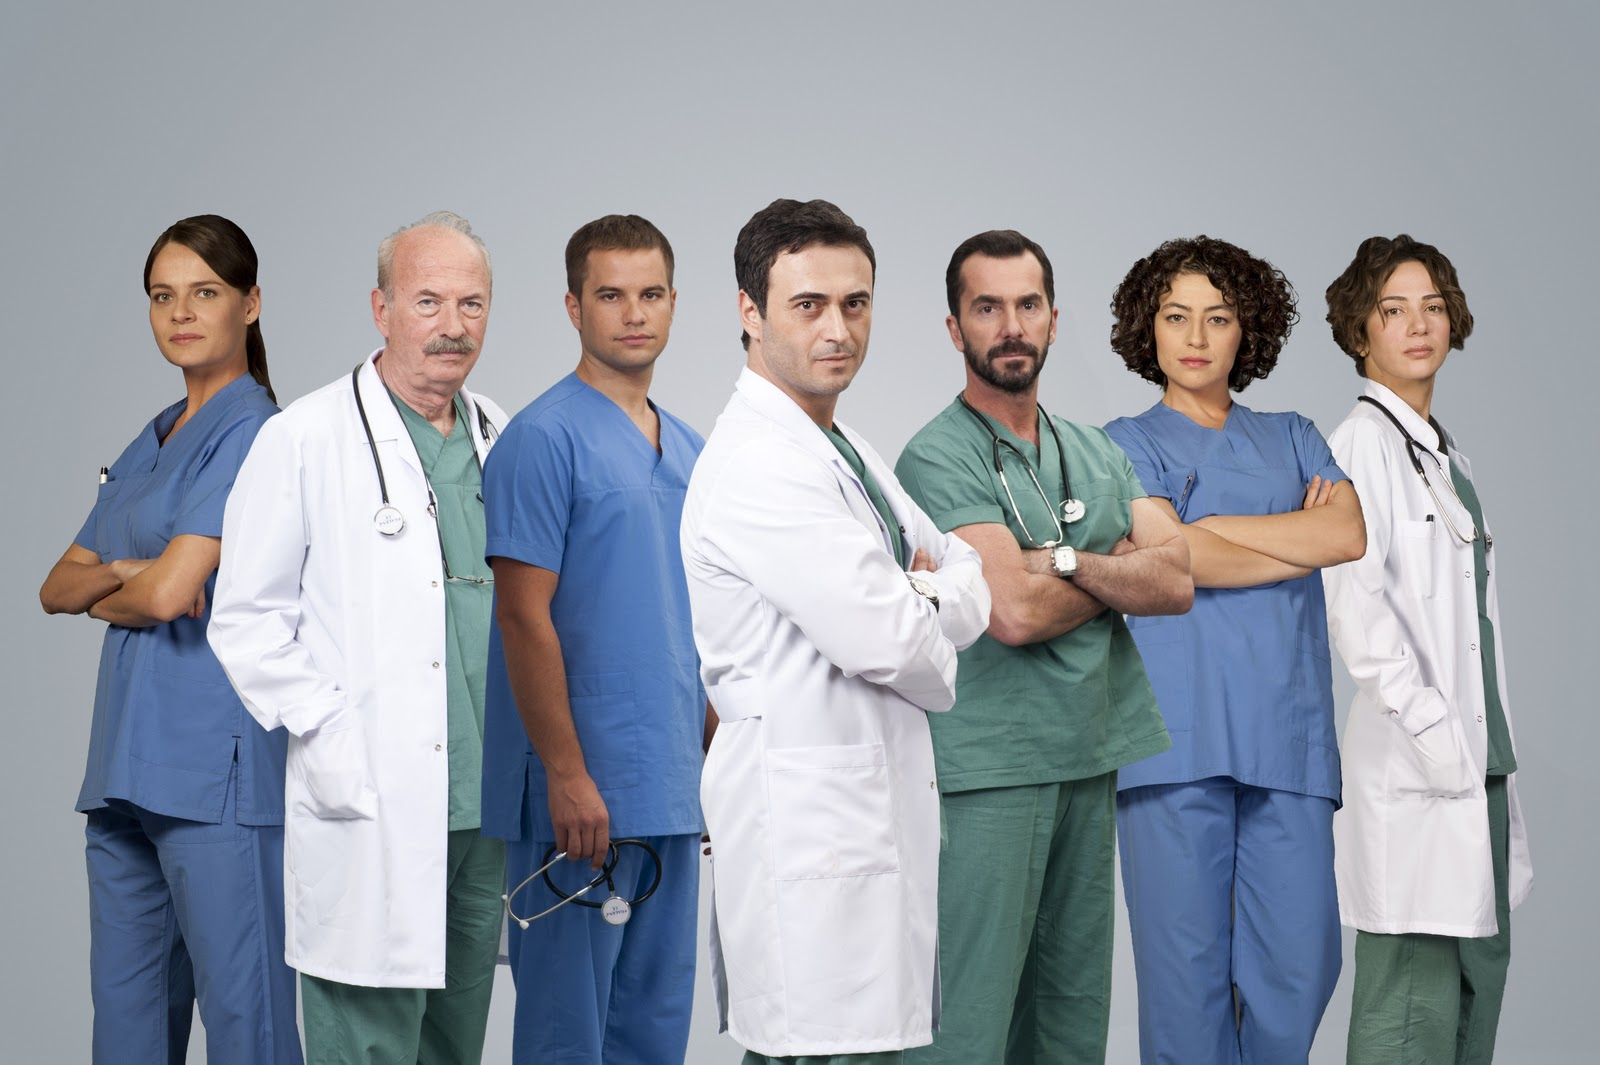 Doktorlar Dizisi Oyunu